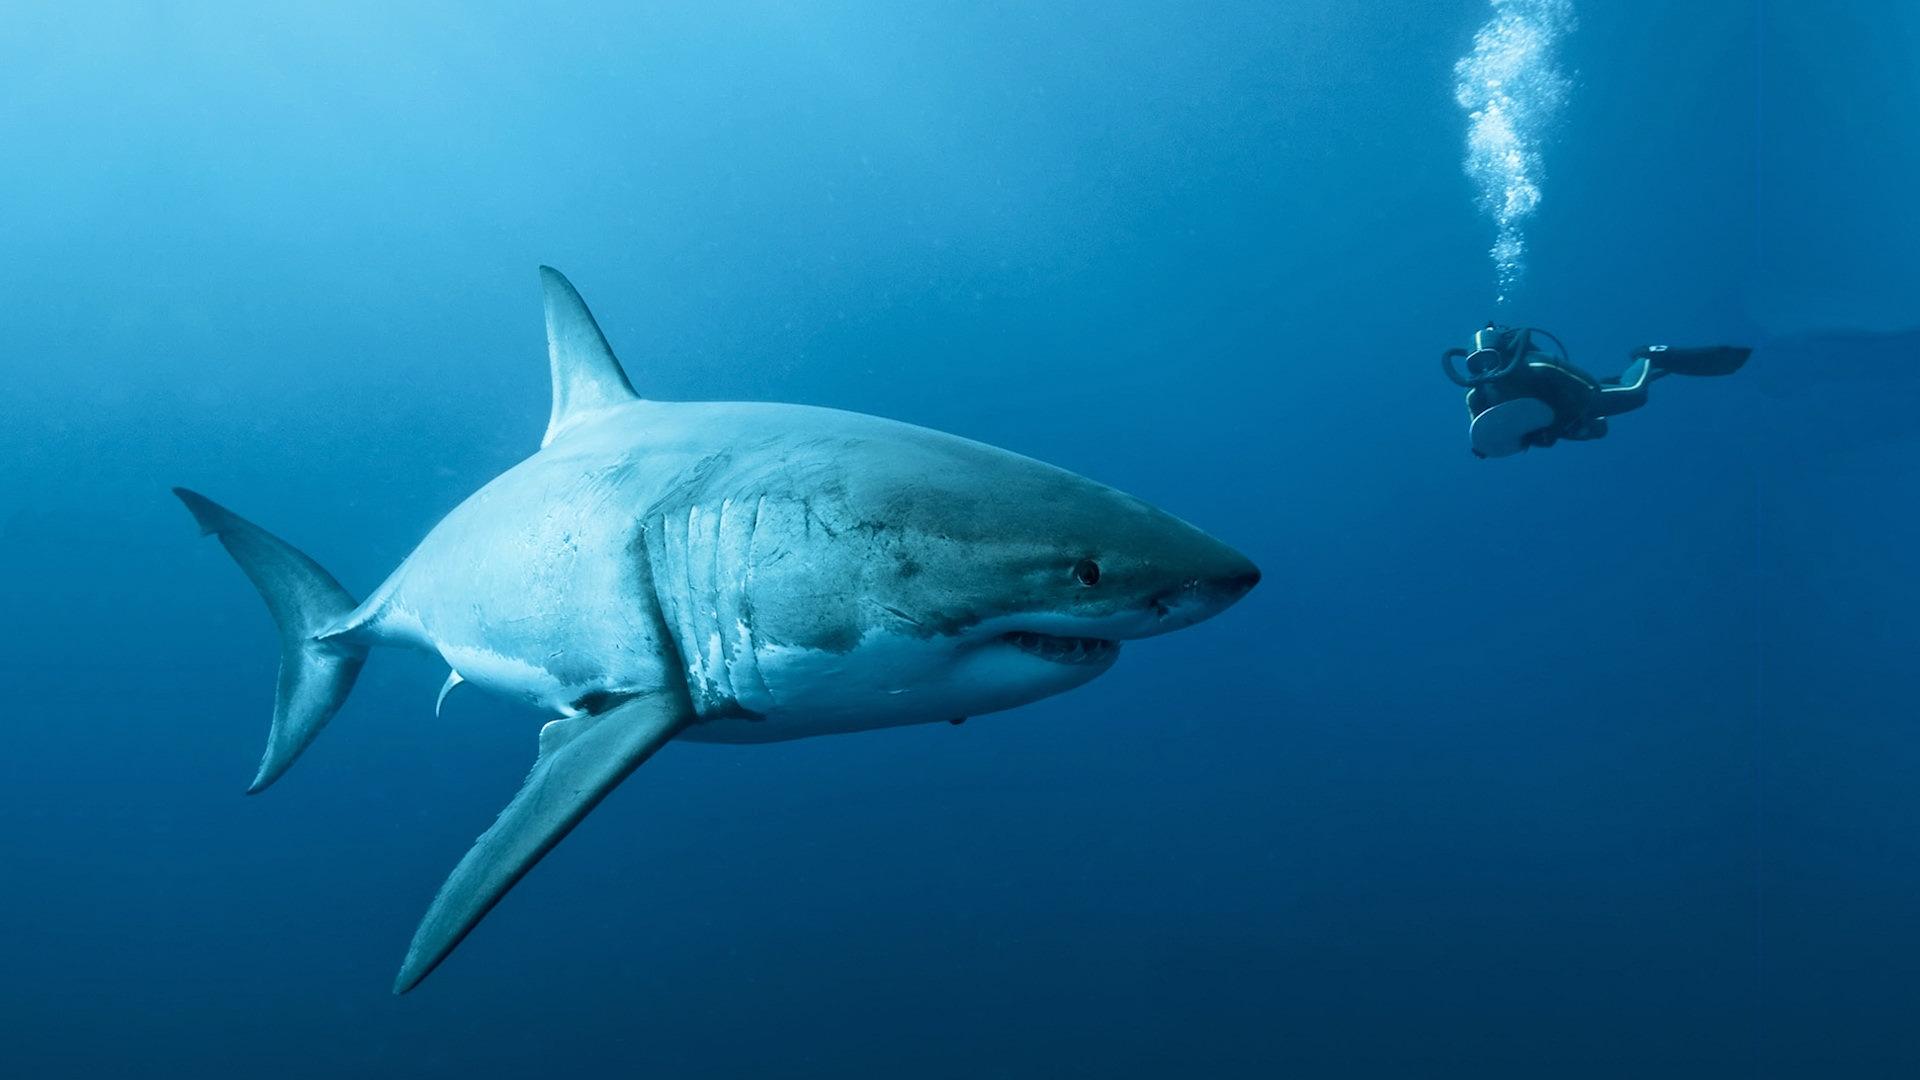 great-white-shark-wallpaper-hd-resolution-88407248.jpg